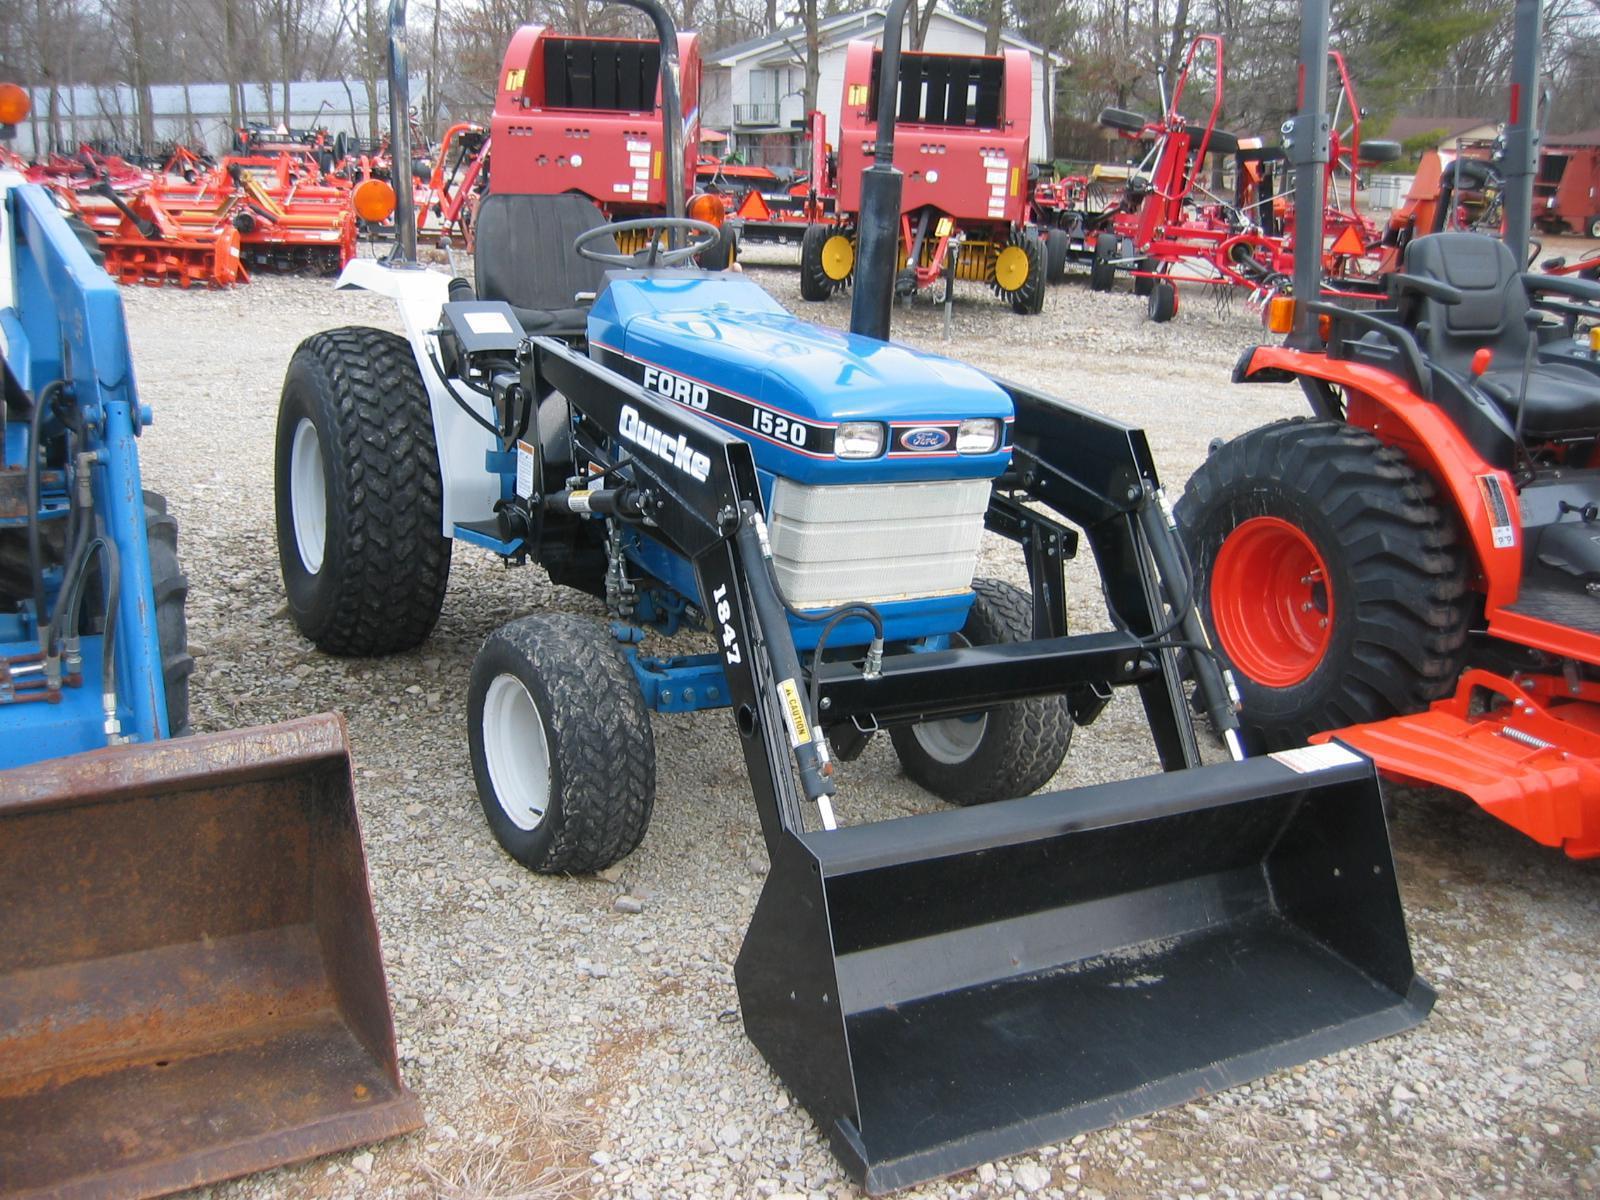 Inventory Farm Equipment Sales Inc  Farmington, MO (573) 756-4121